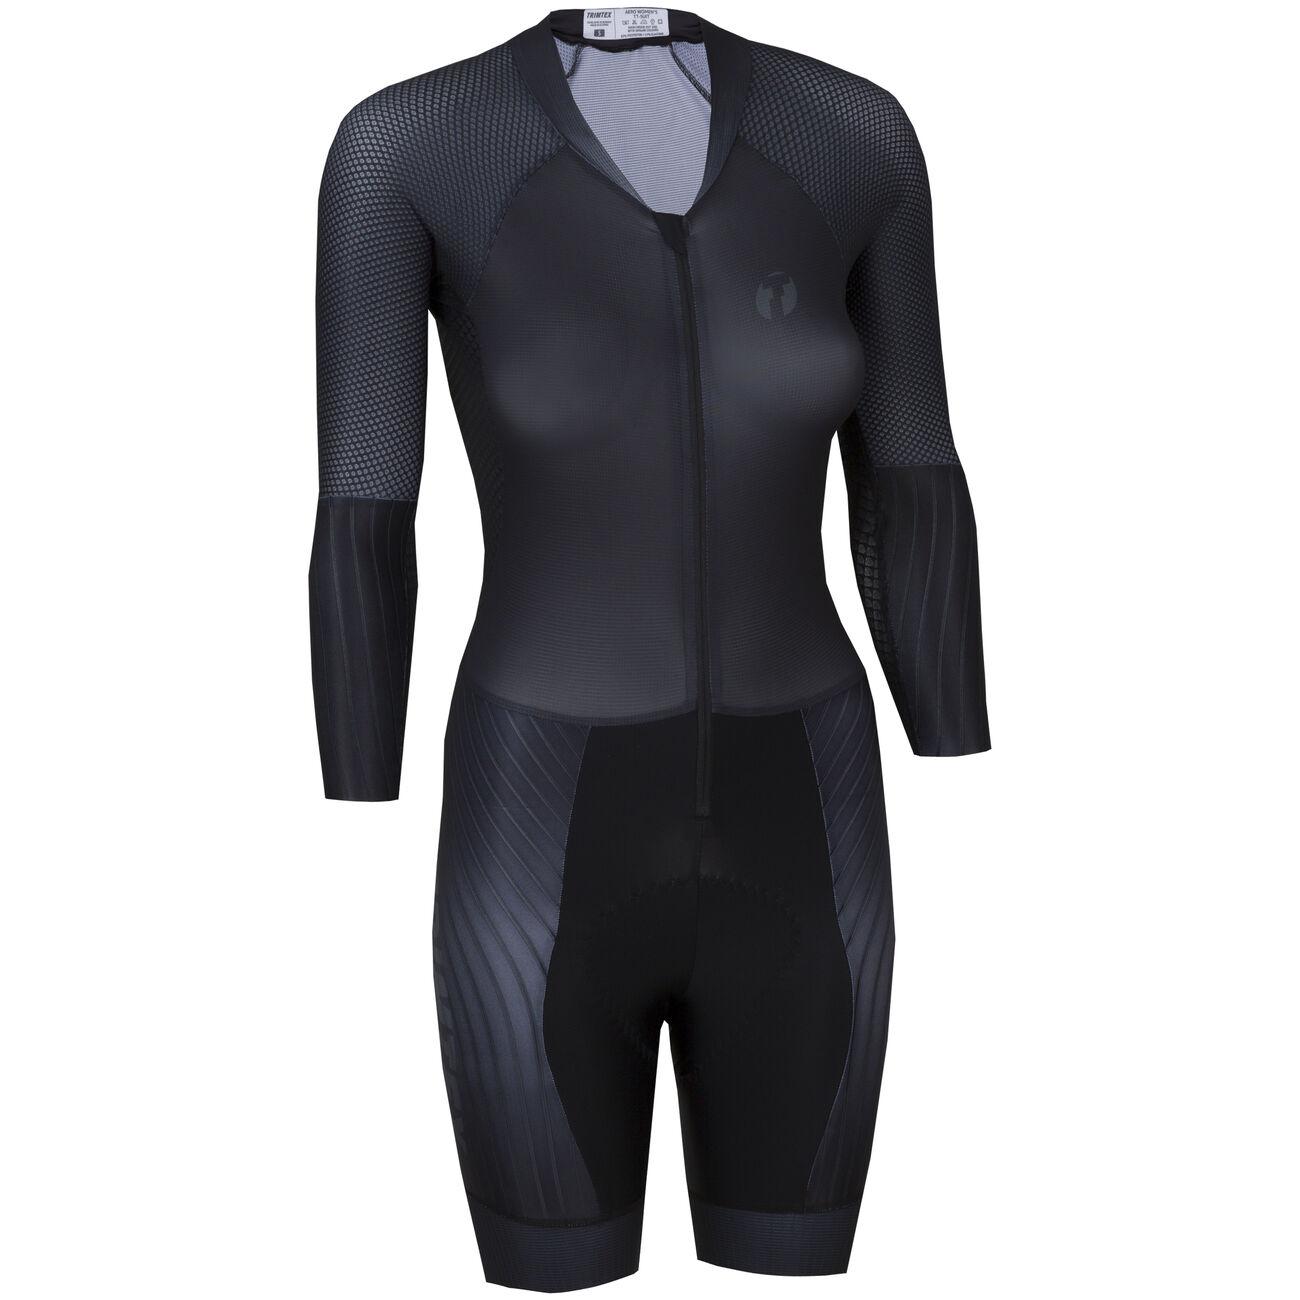 Aero 2.0 TT-Suit women's